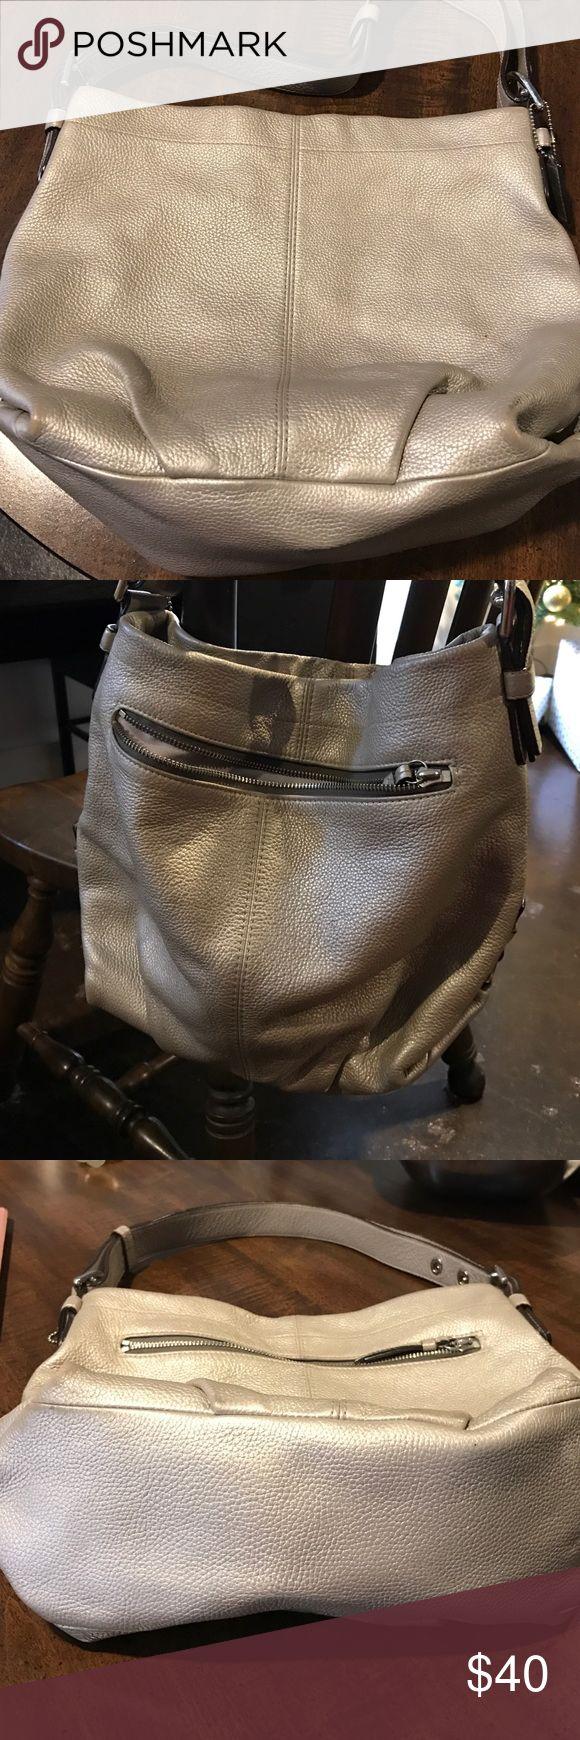 Coach Shoulder Bag Silver shoulder bag Coach Bags Shoulder Bags